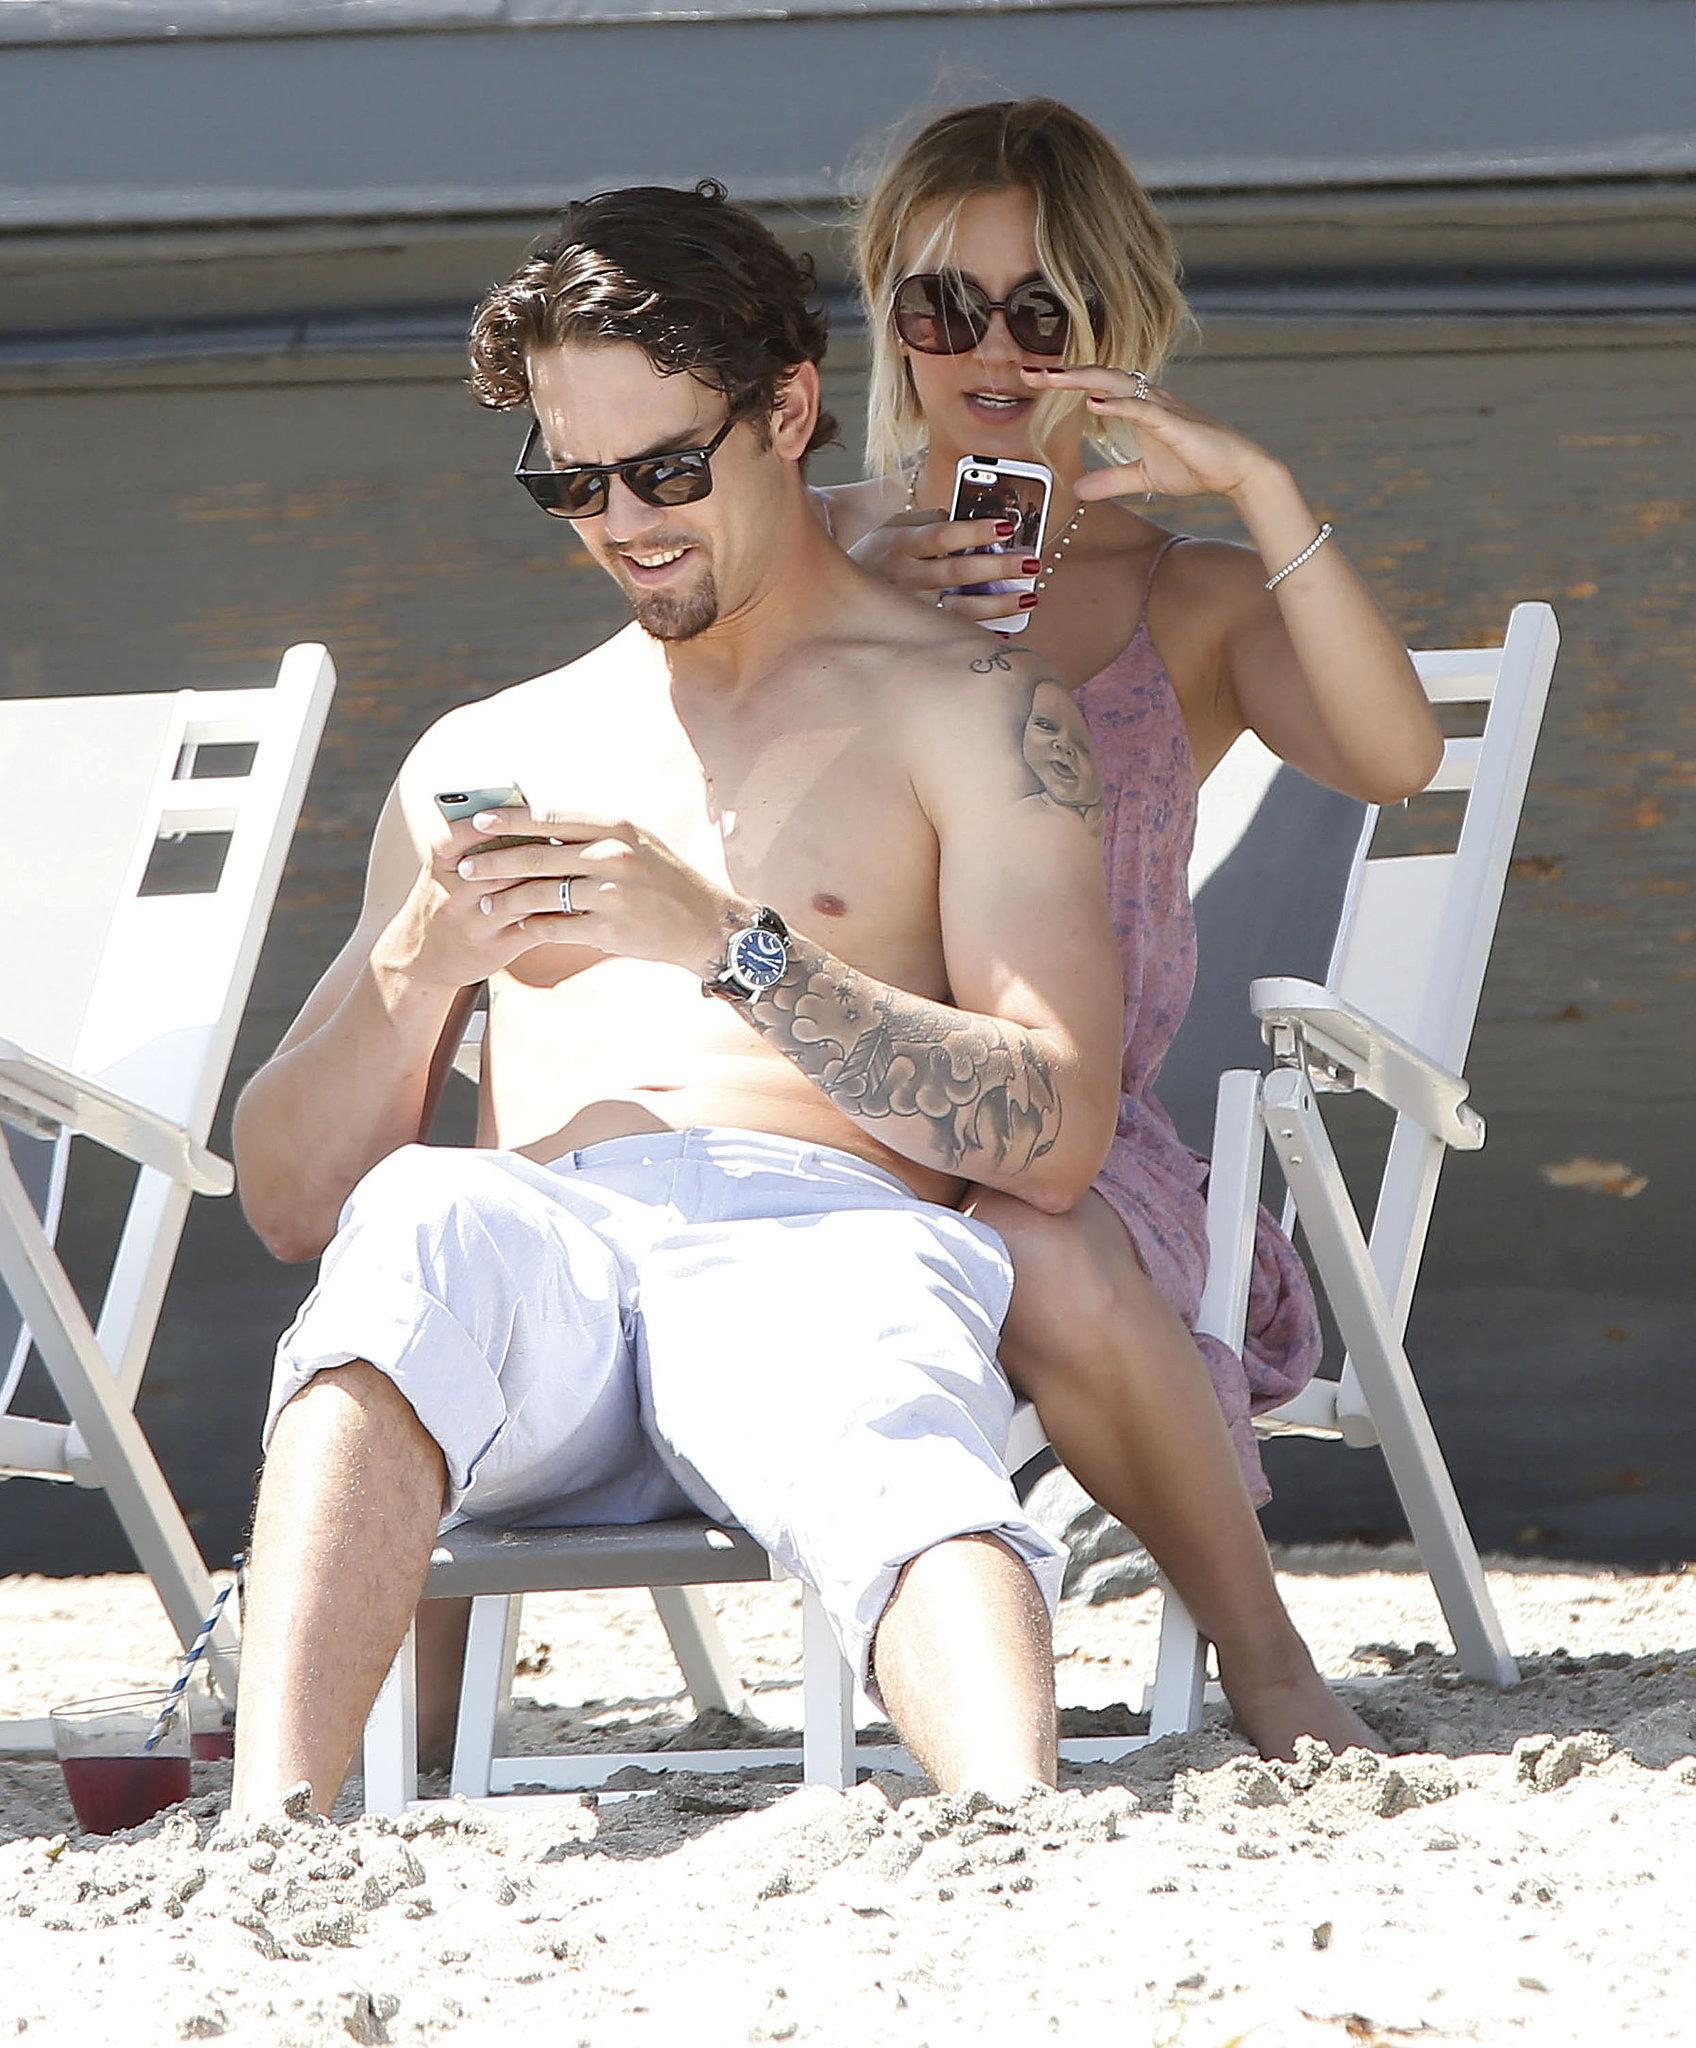 Sip, Selfie, Snuggle: Kaley Cuoco and Ryan Sweeting's Memorial Day PDA